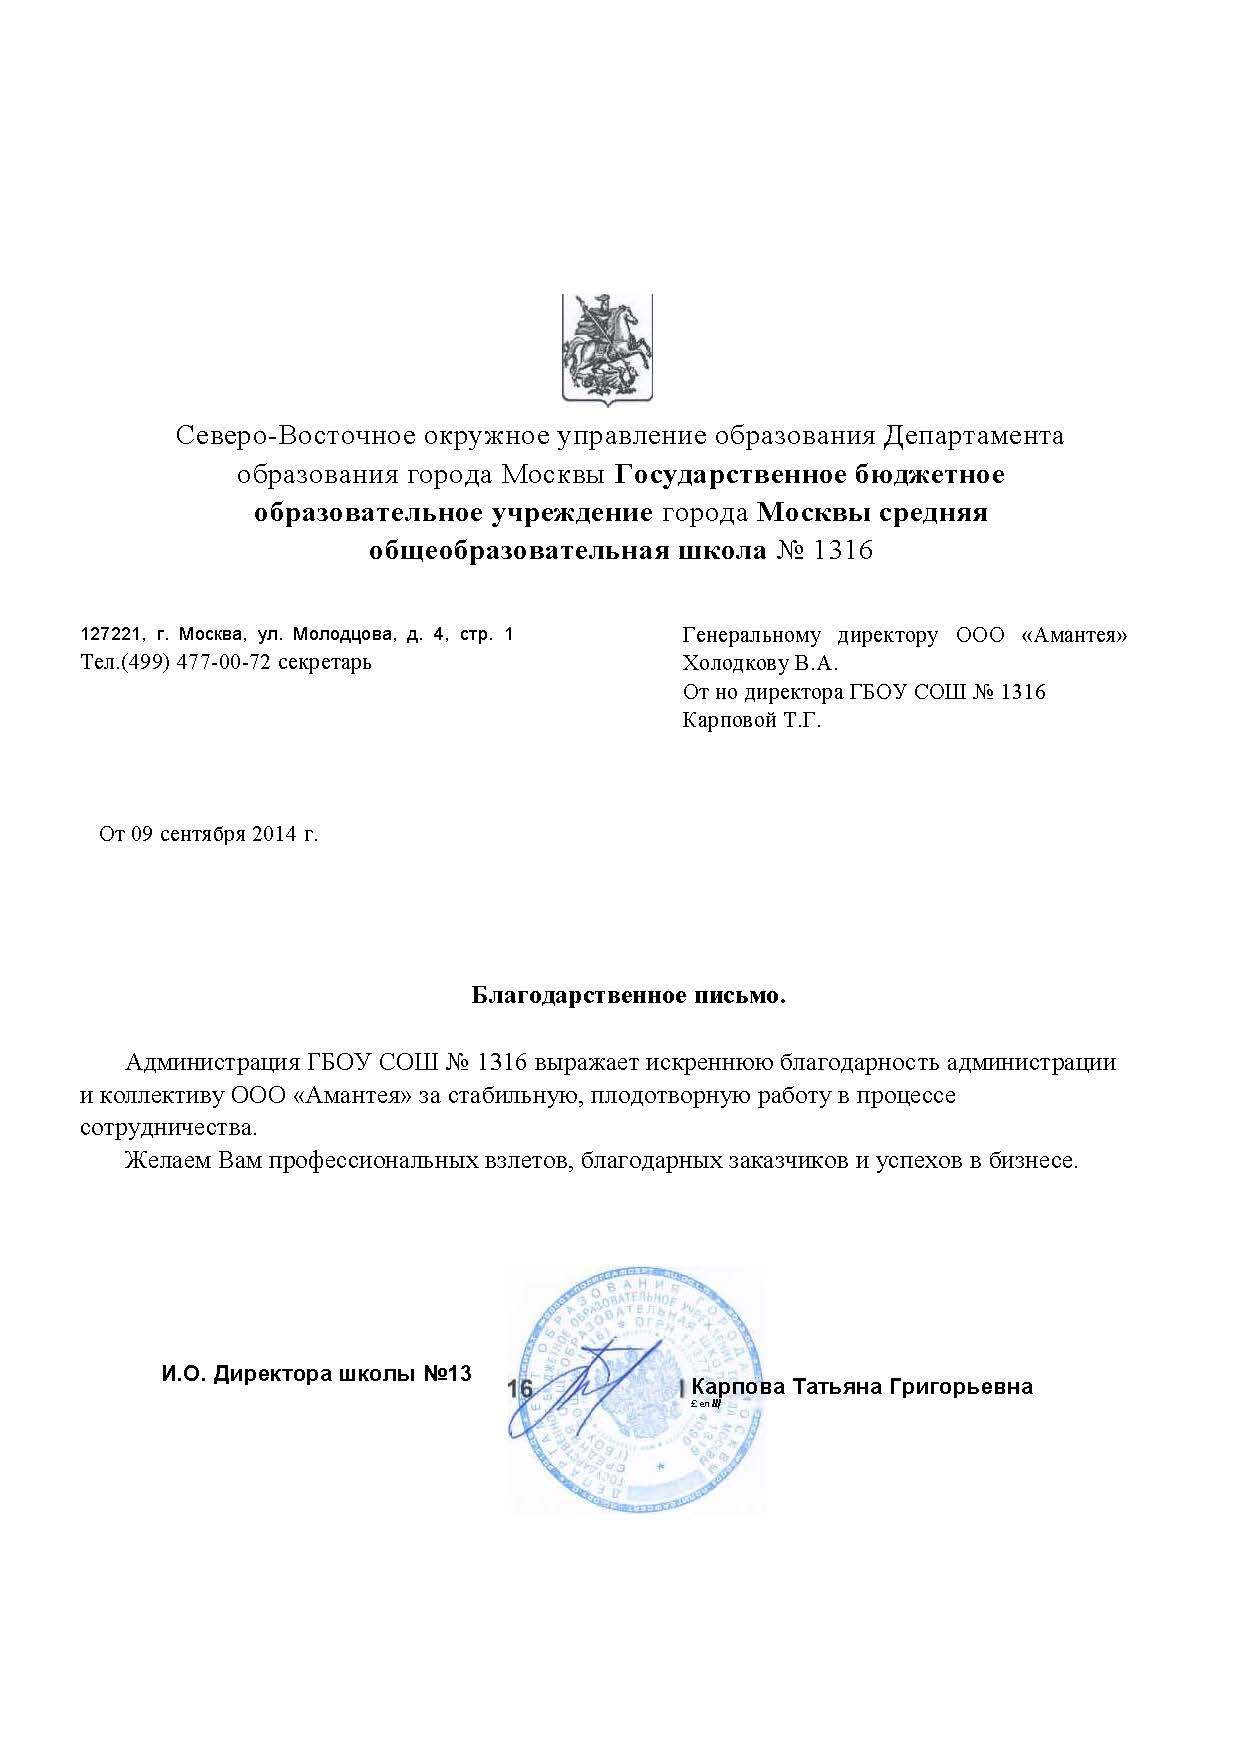 ГБОУ СОШ №1316